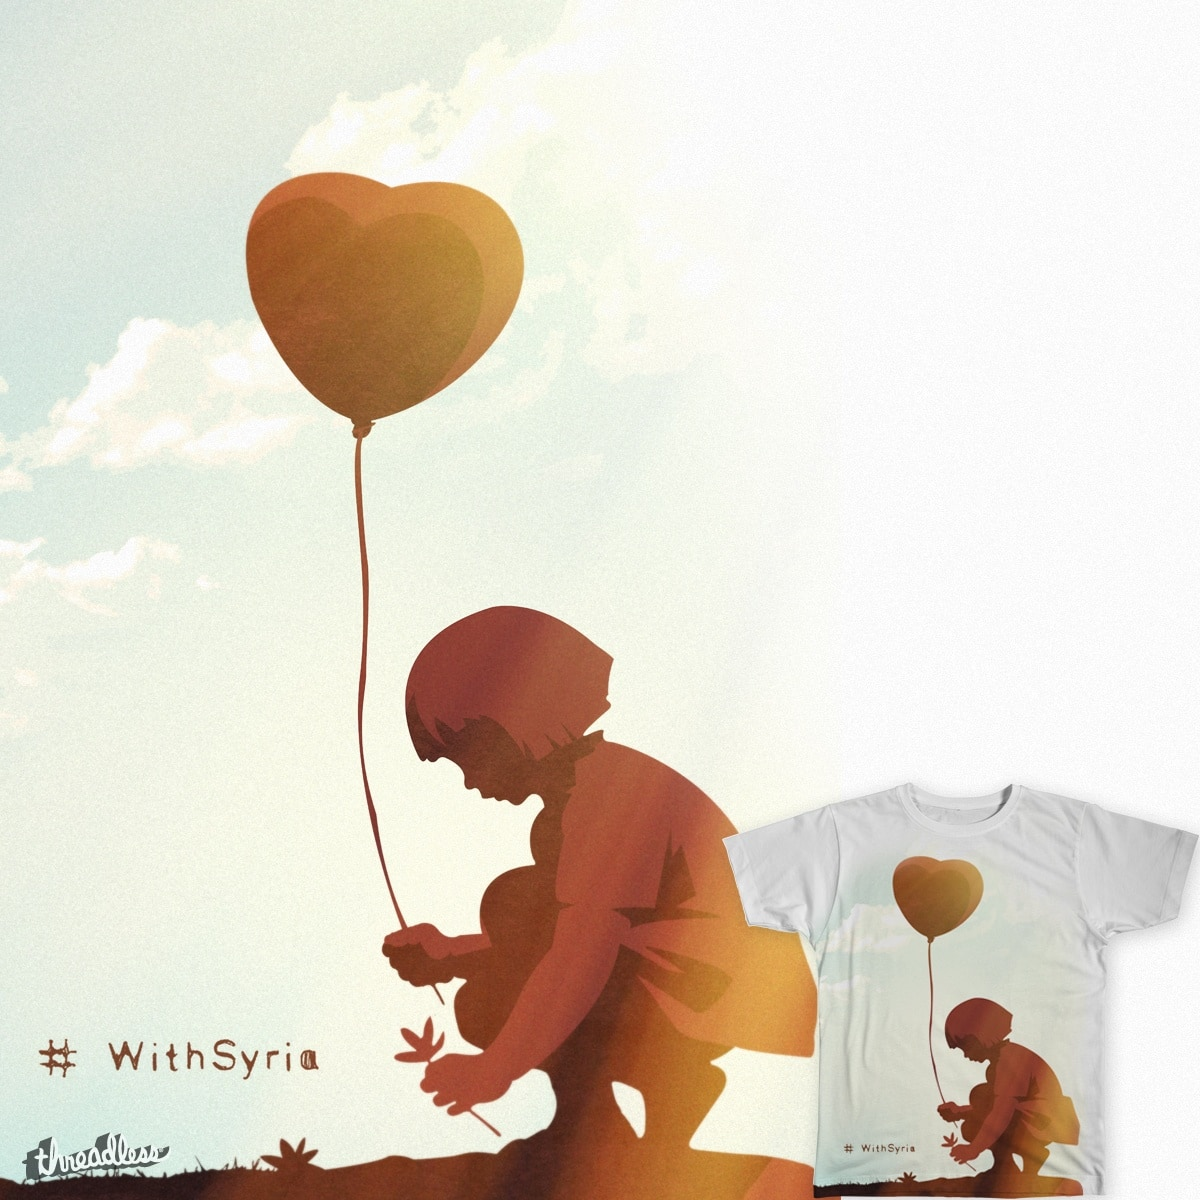 #withSyria by sedki-alimam on Threadless